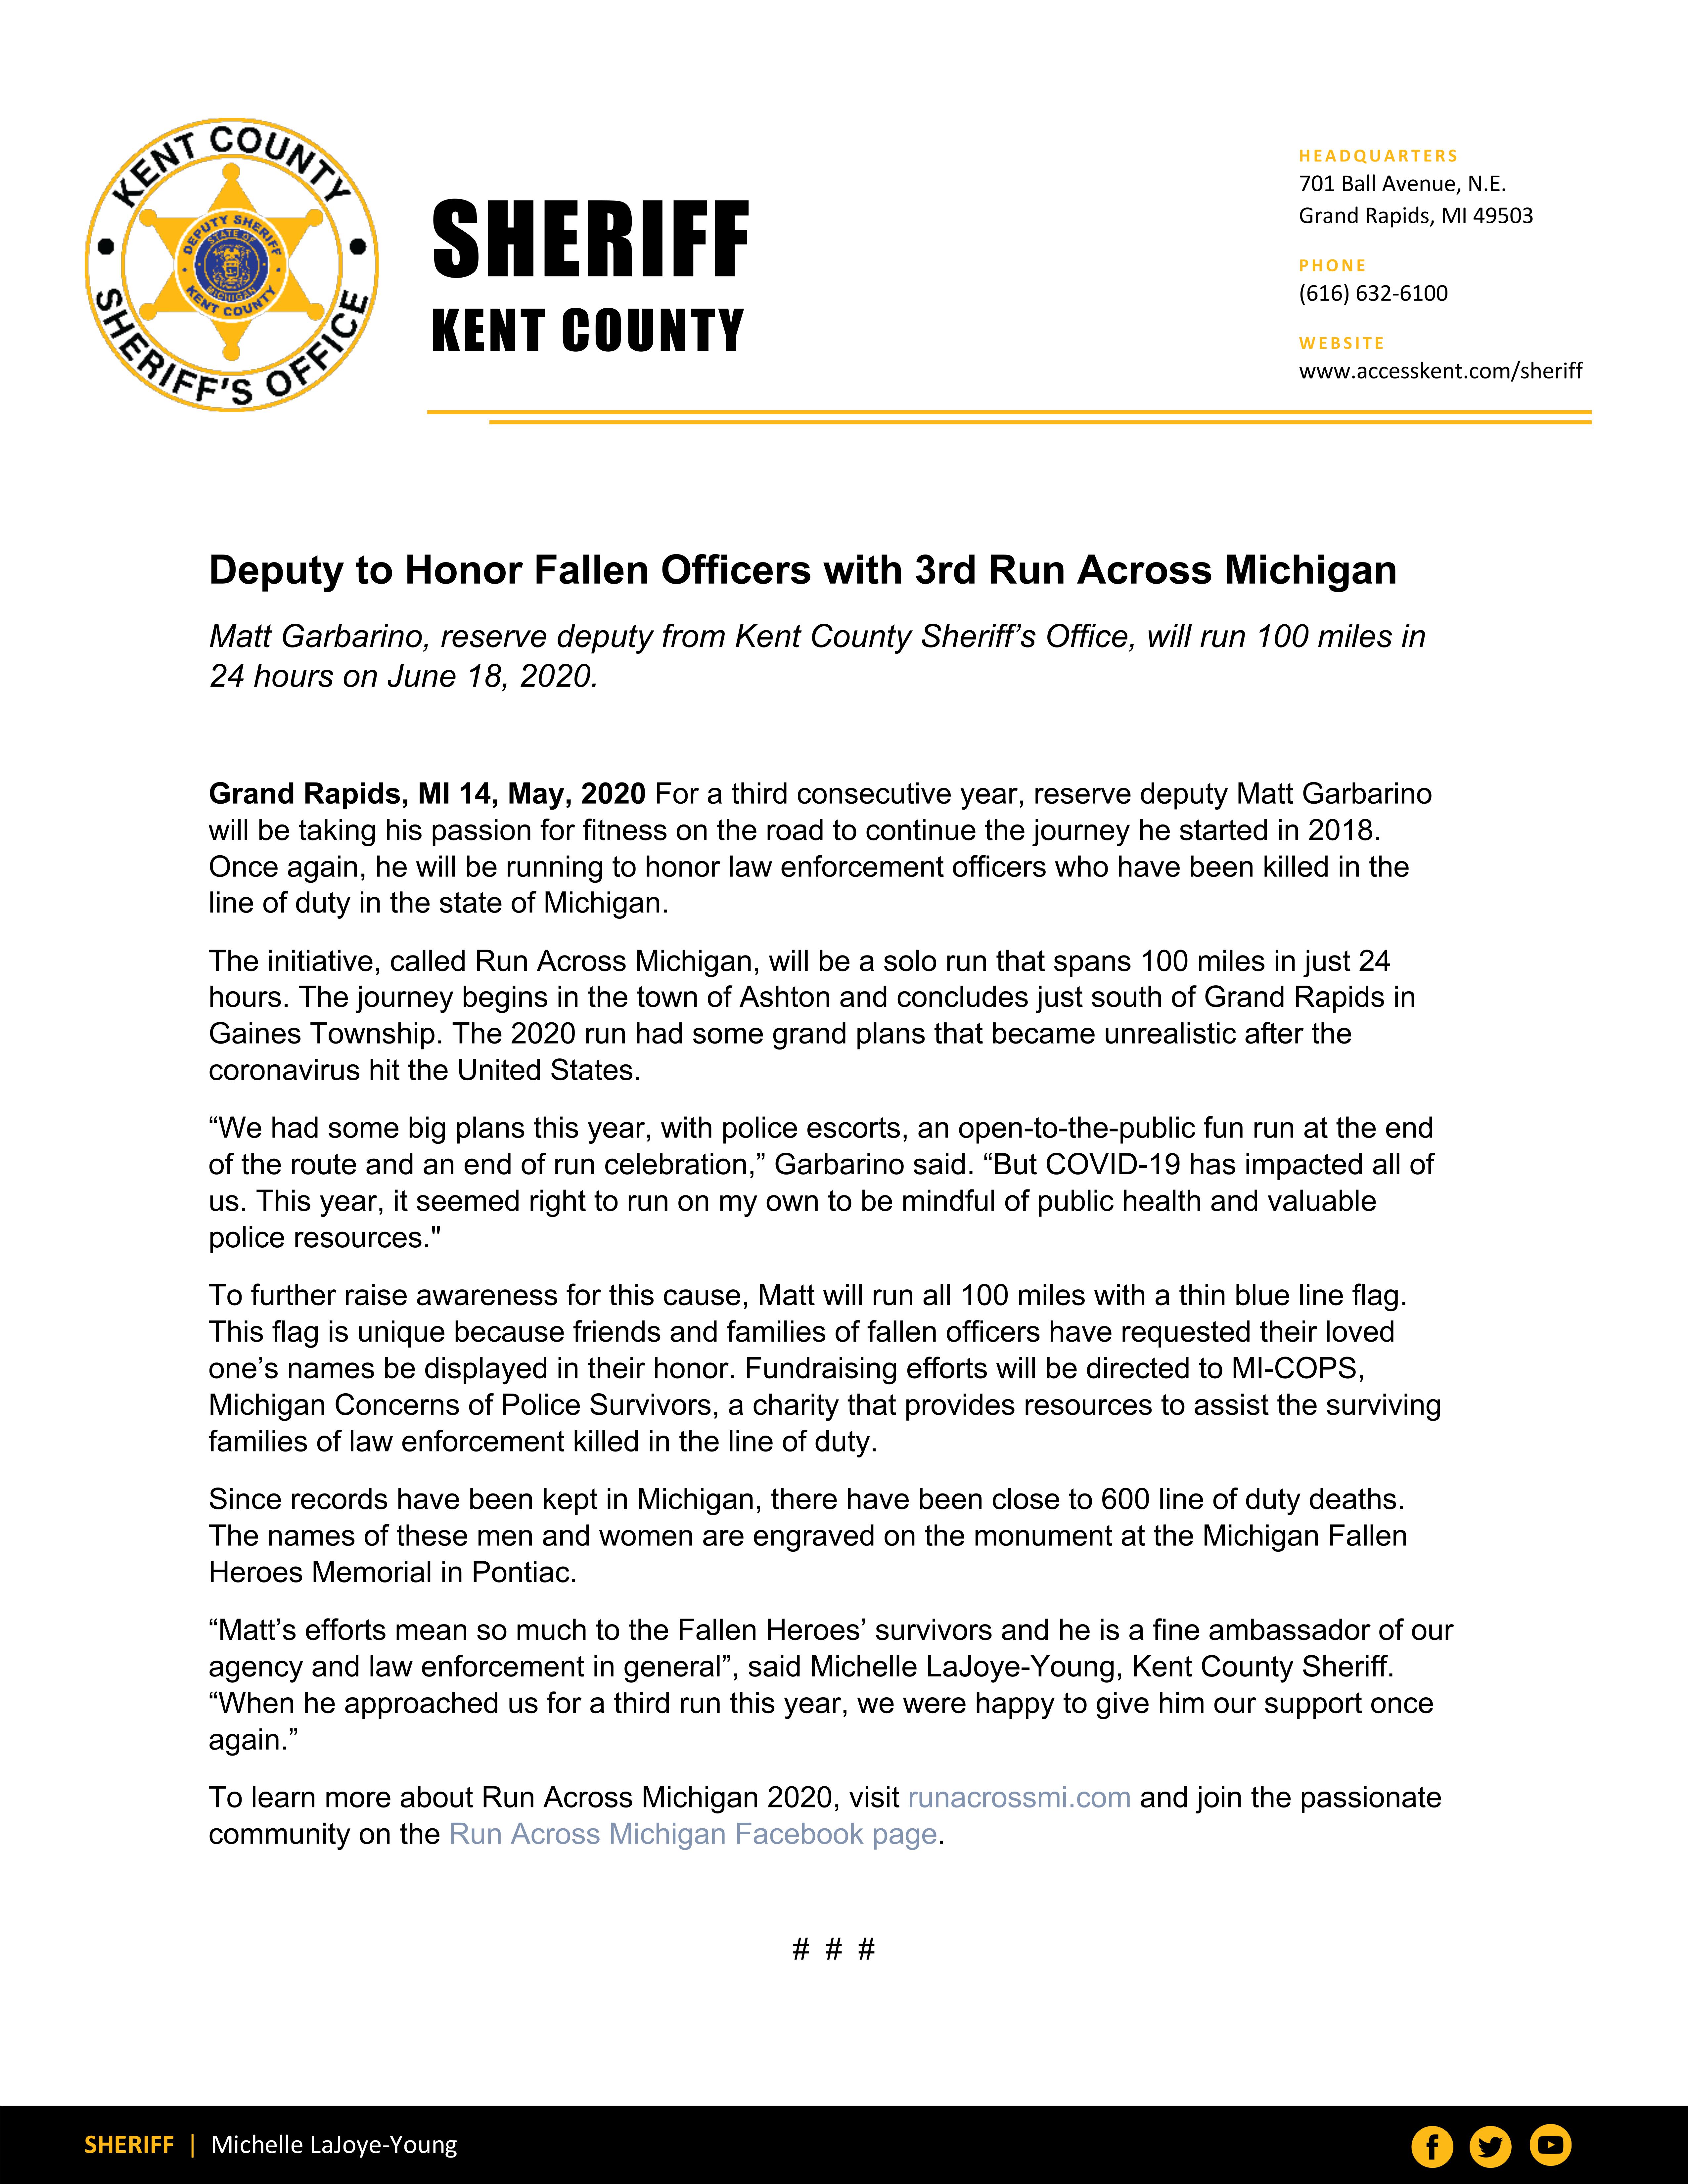 Reserve Deputy Honors Fallen Officers in Run Across Michigan